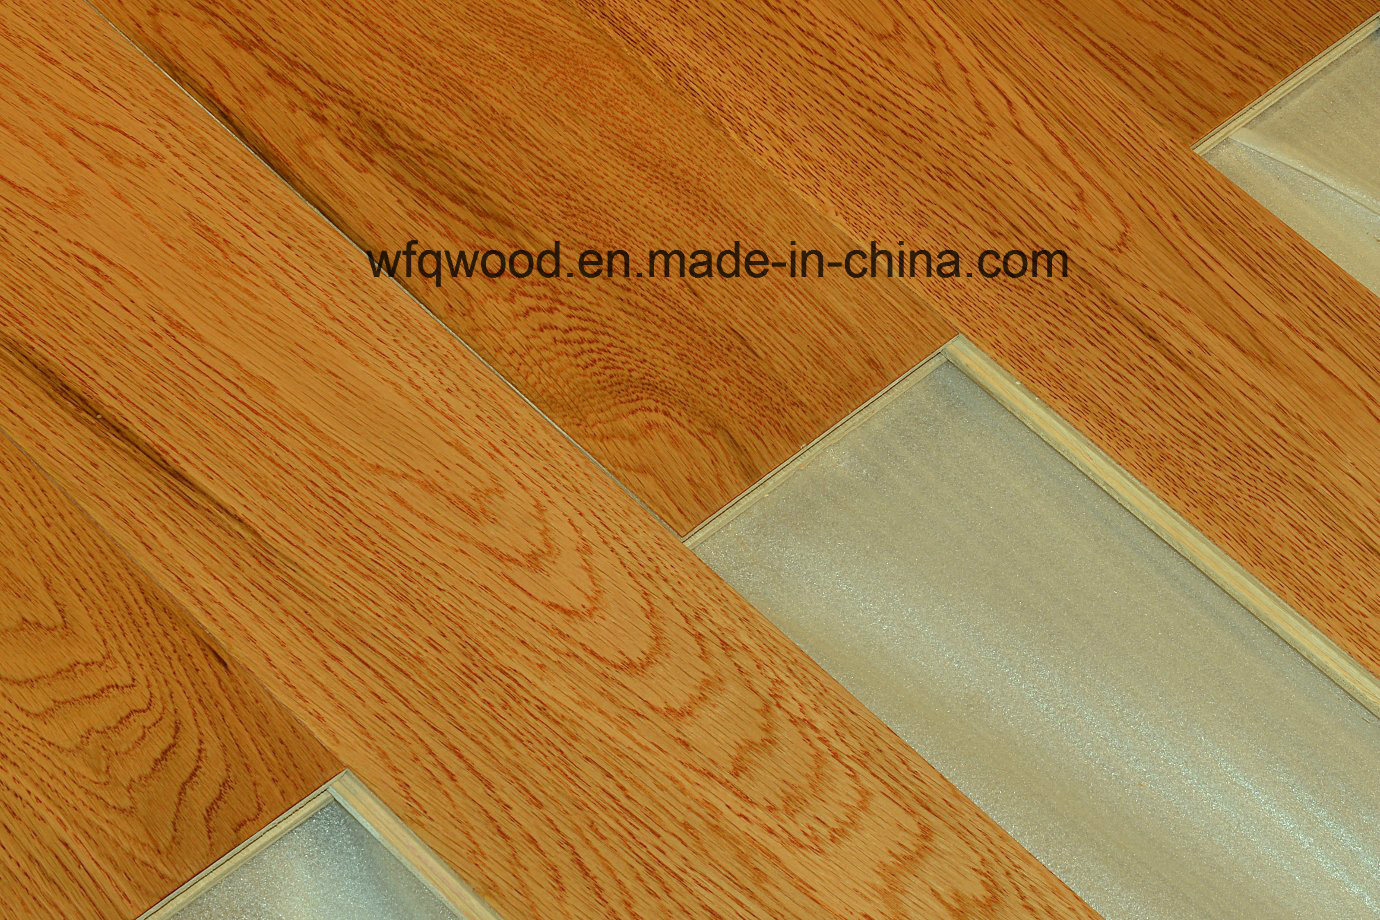 105 Multilayer Oak Wood Flooring